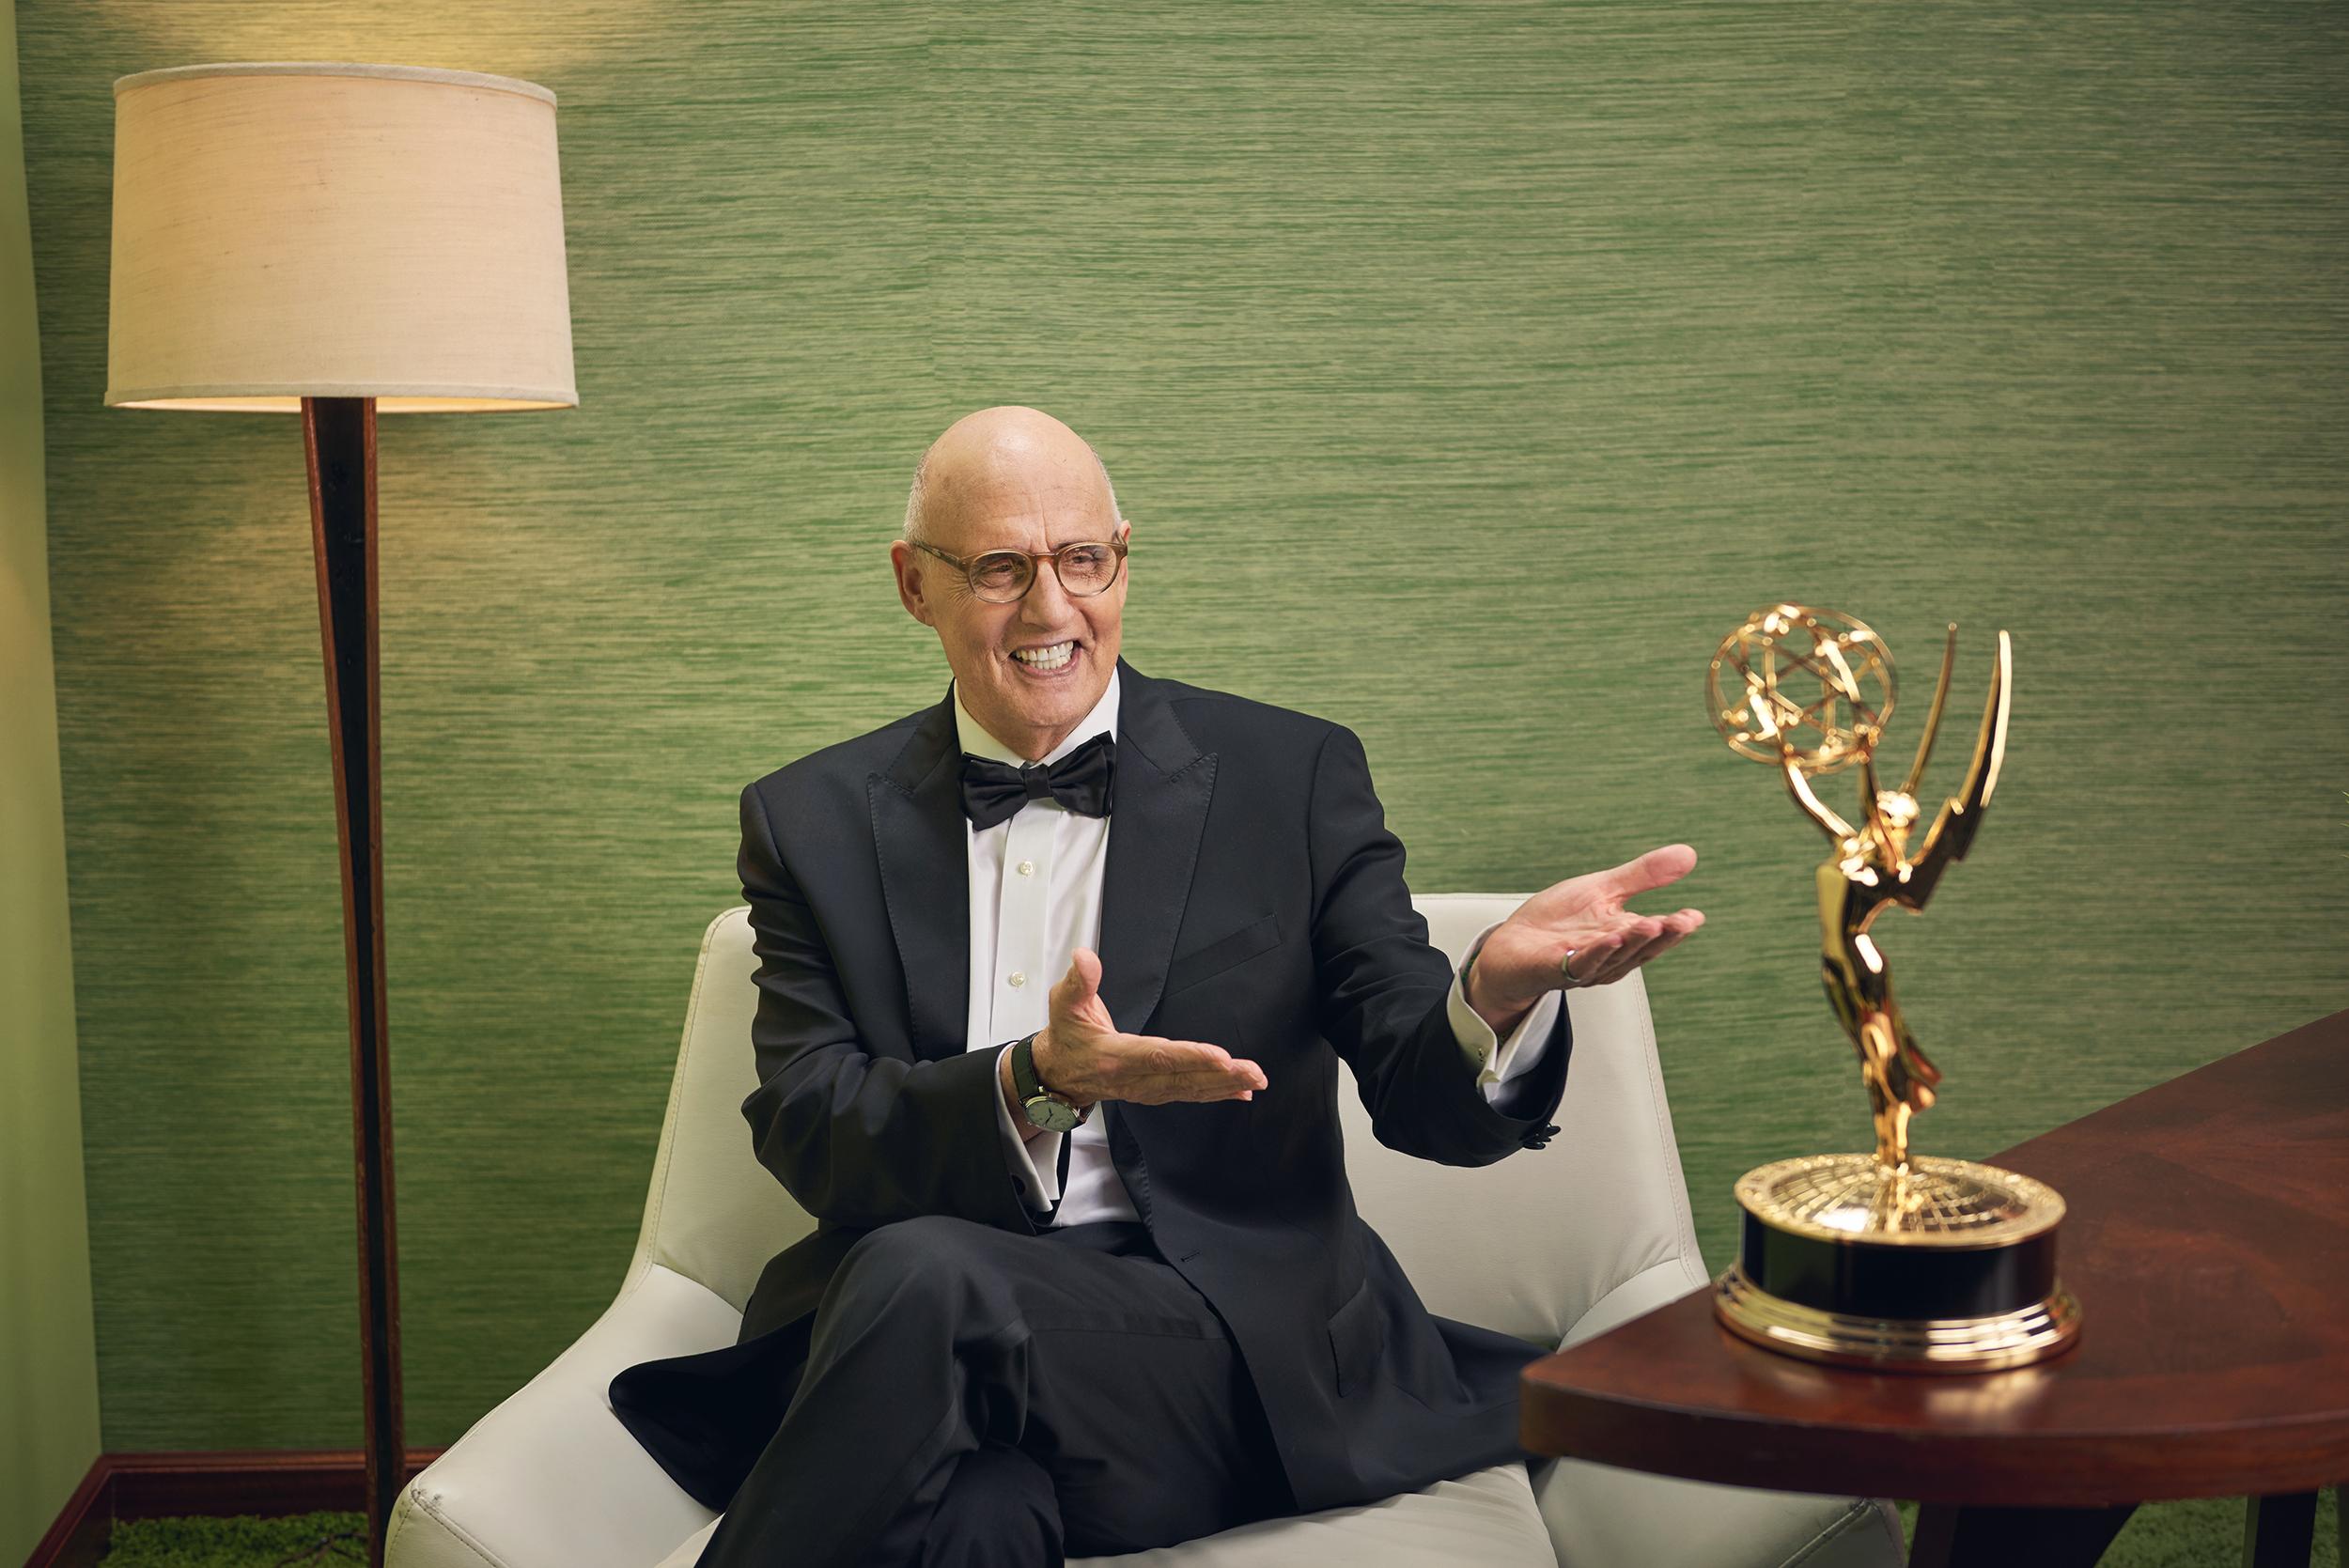 FILE_Jeffrey_Tambor Emmys 201738484.jpg